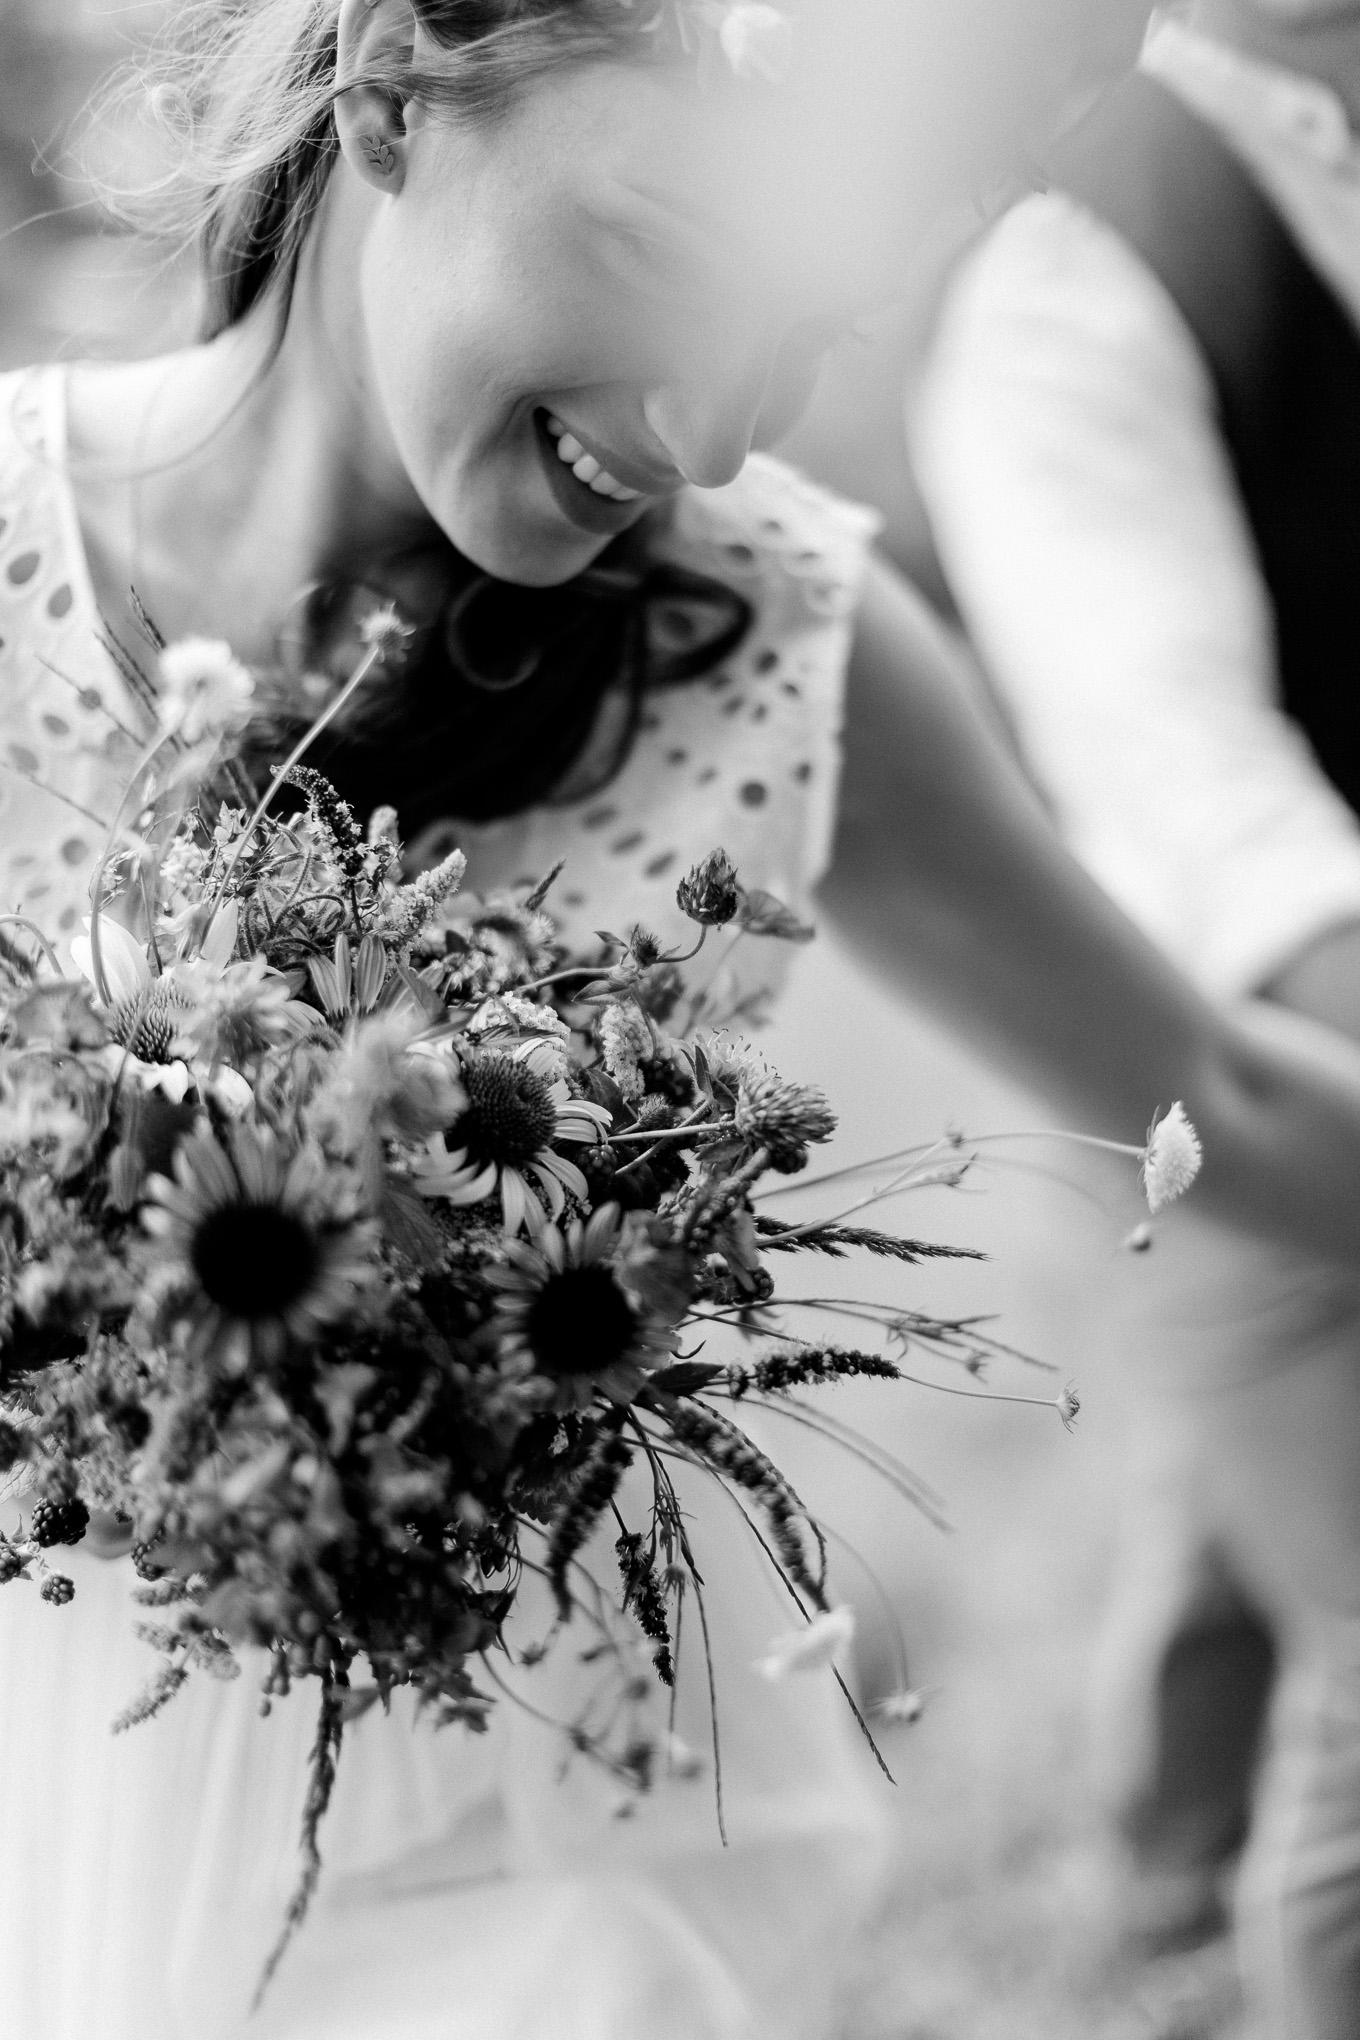 Boho-Scheune-Bauern-Hochzeit-Lörrach-Rheinfelden-Pia-Anna-Christian-Photography-NC-10.jpg